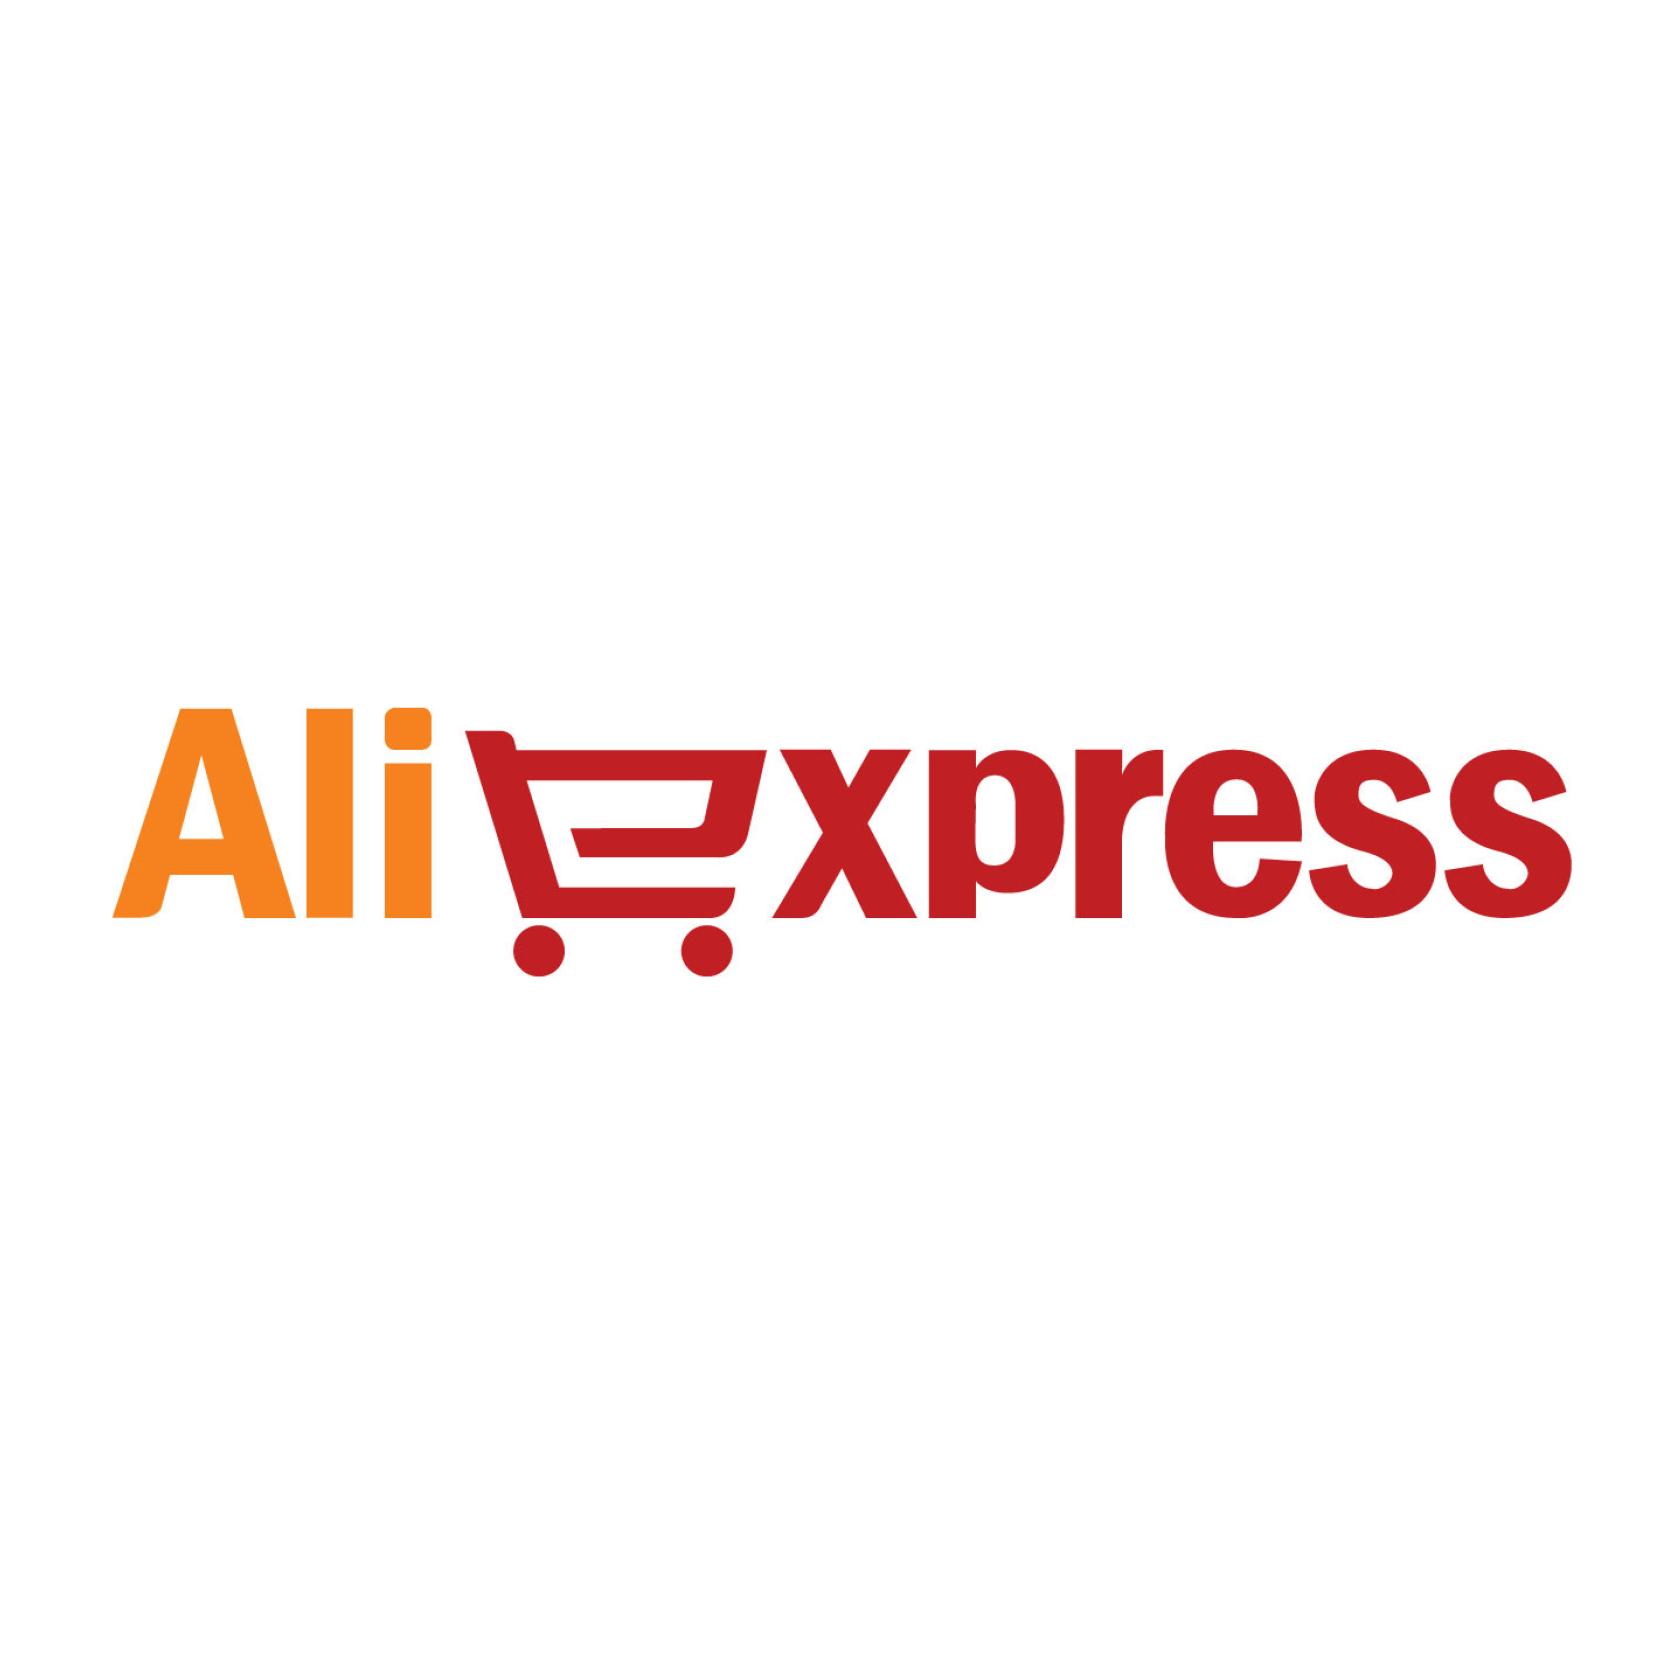 Alle 6 AliExpress kortingscodes geldig in juli 2019